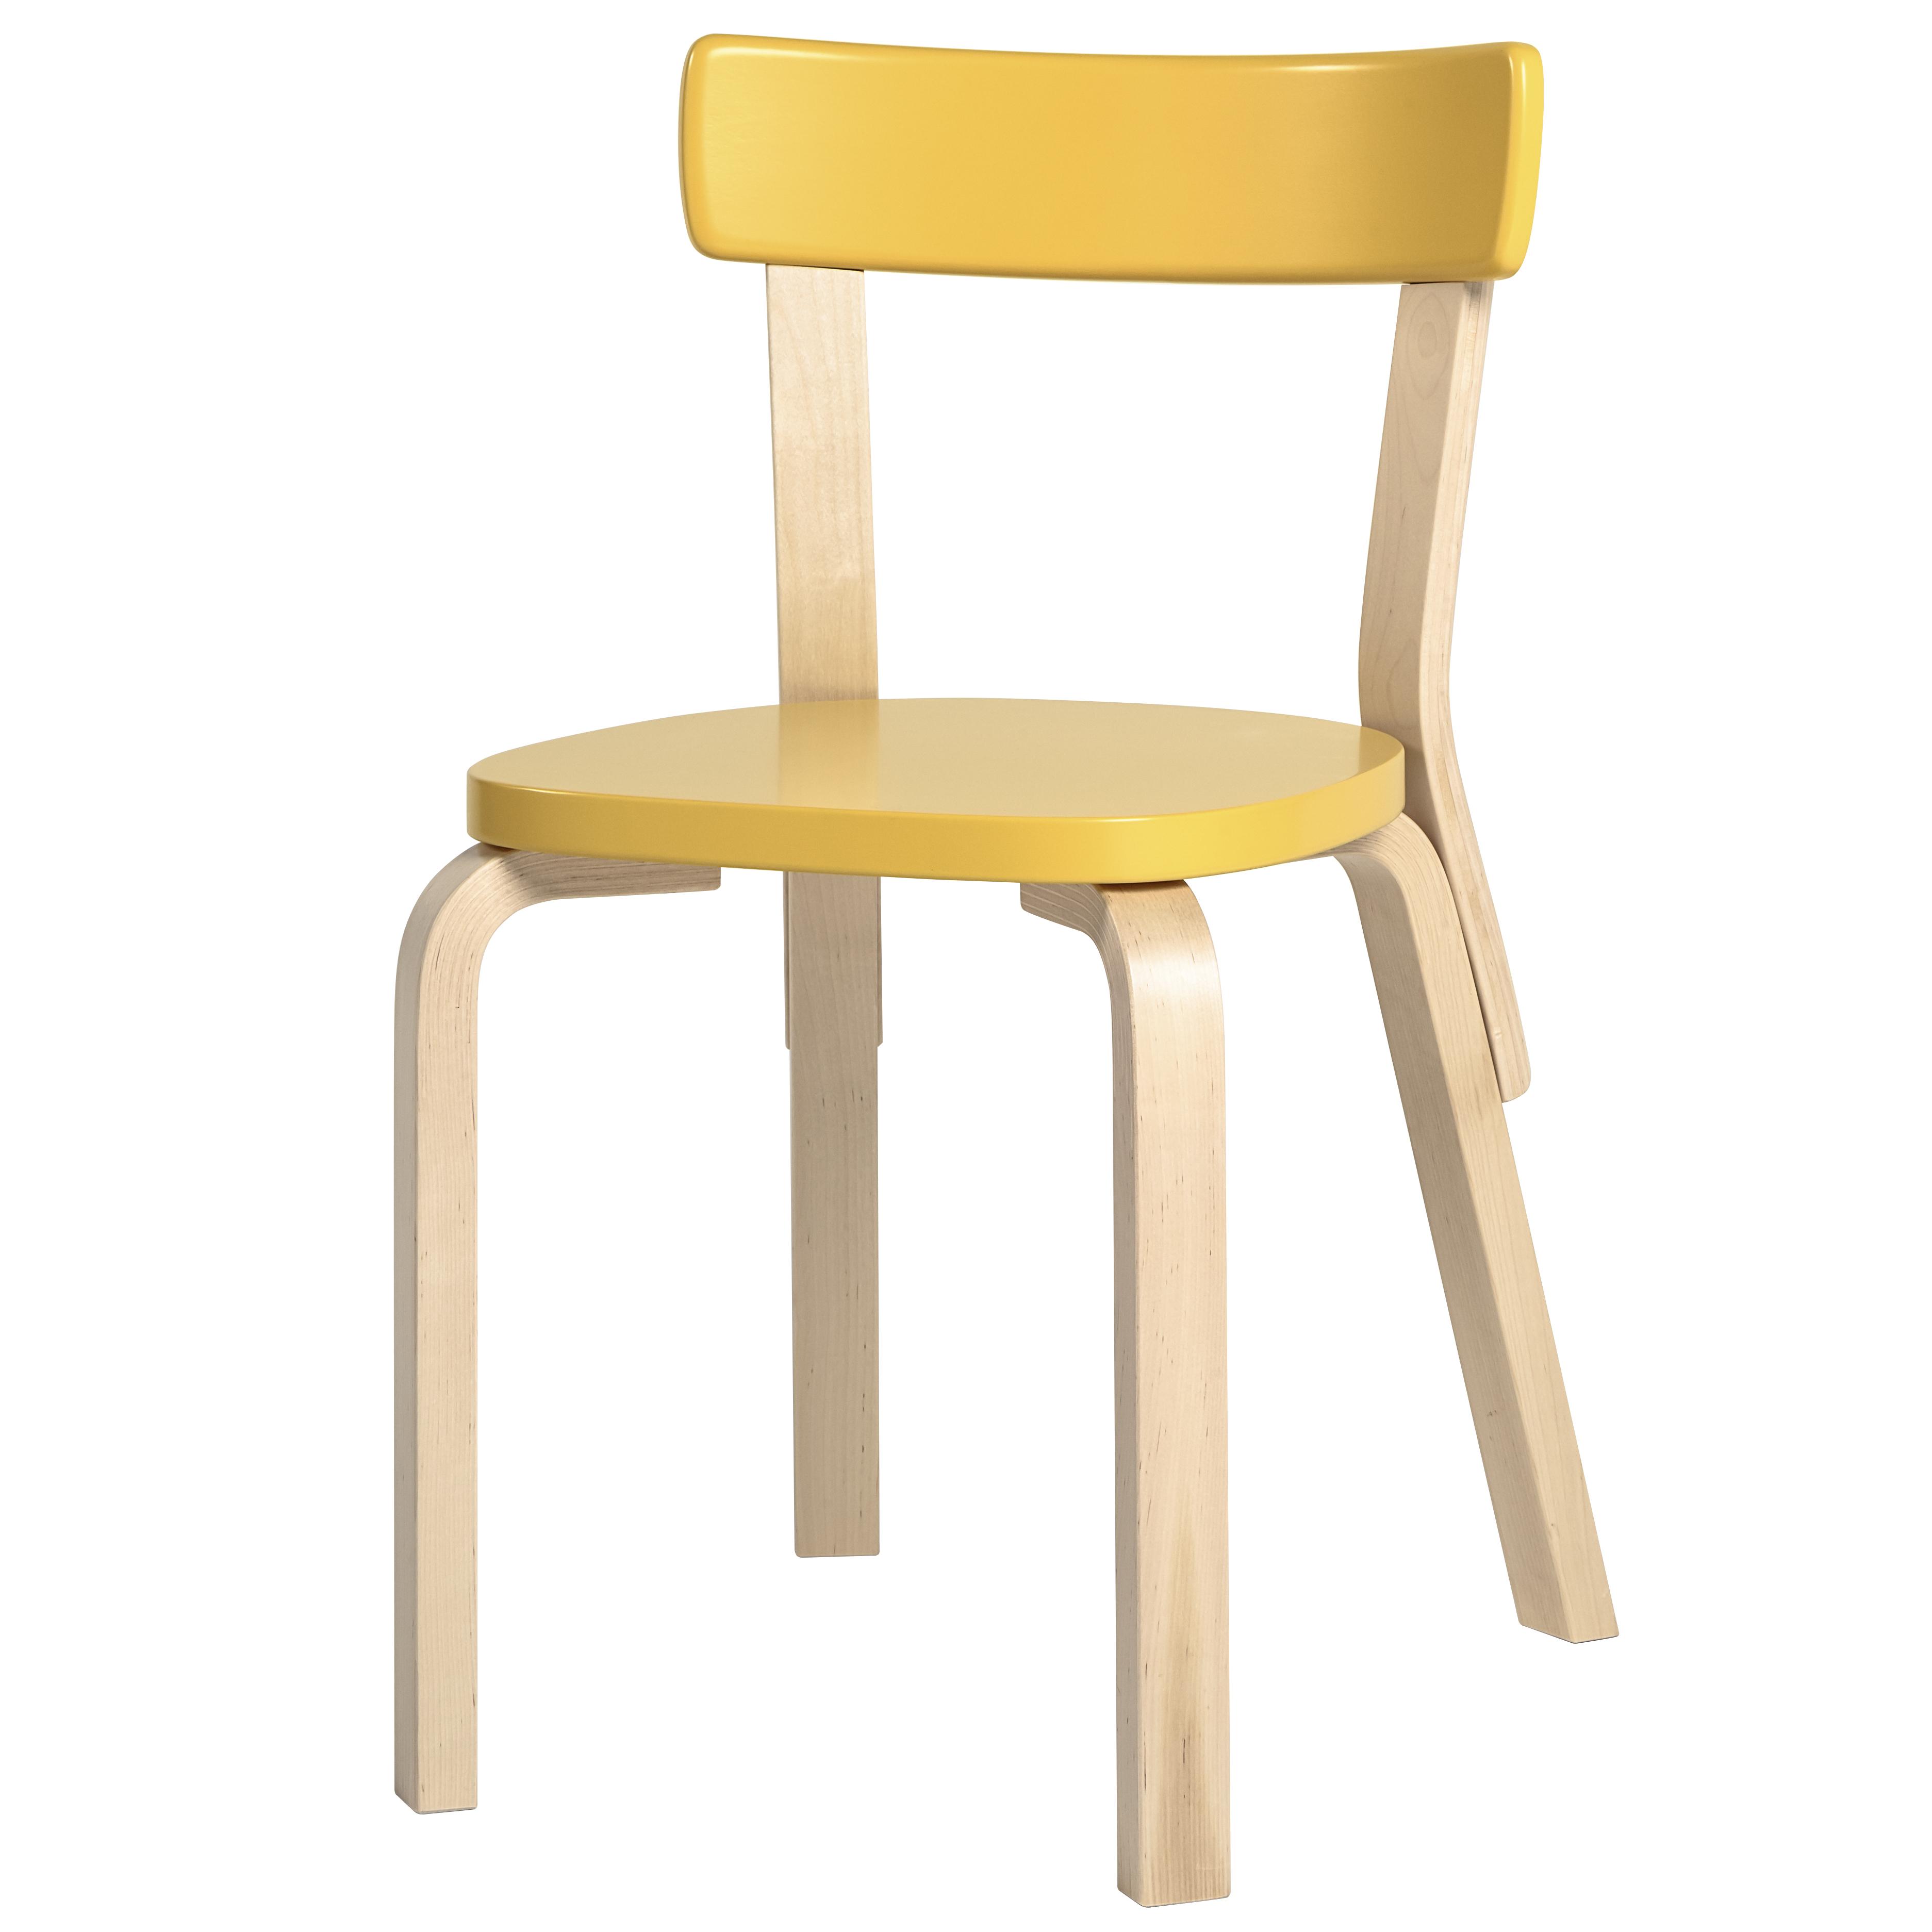 Artek Dress The Chair : Chair artek design alvar aalto